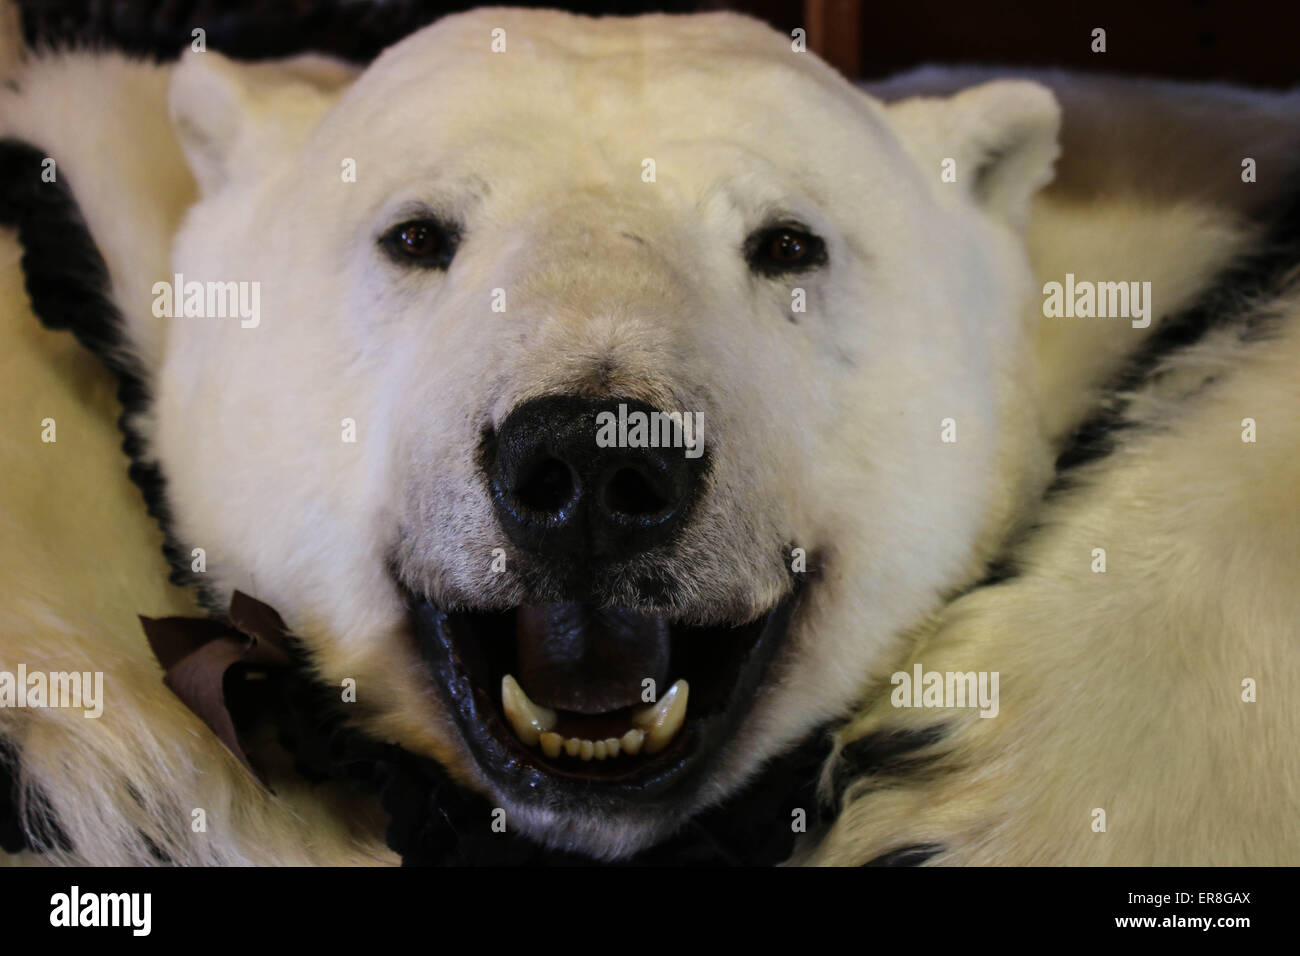 Polar Bear Skin - Stock Image